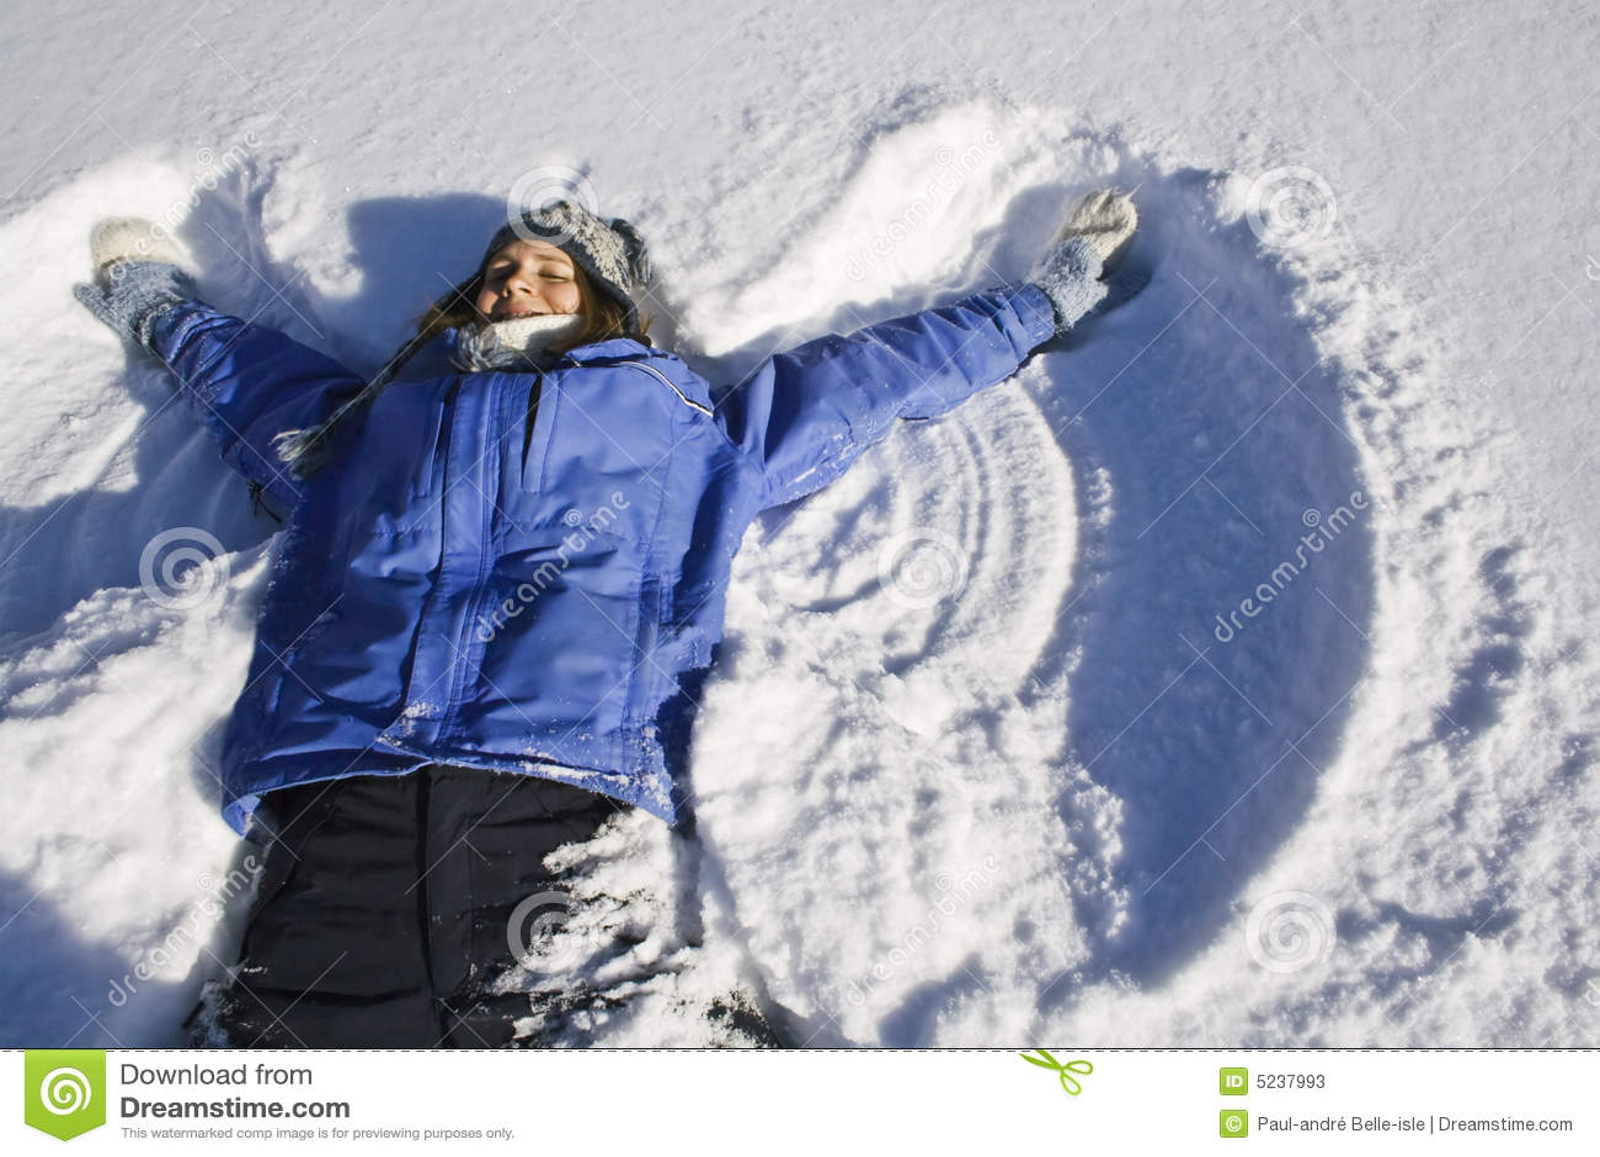 193 ngel de la nieve fotos de archivo imagen 5237993